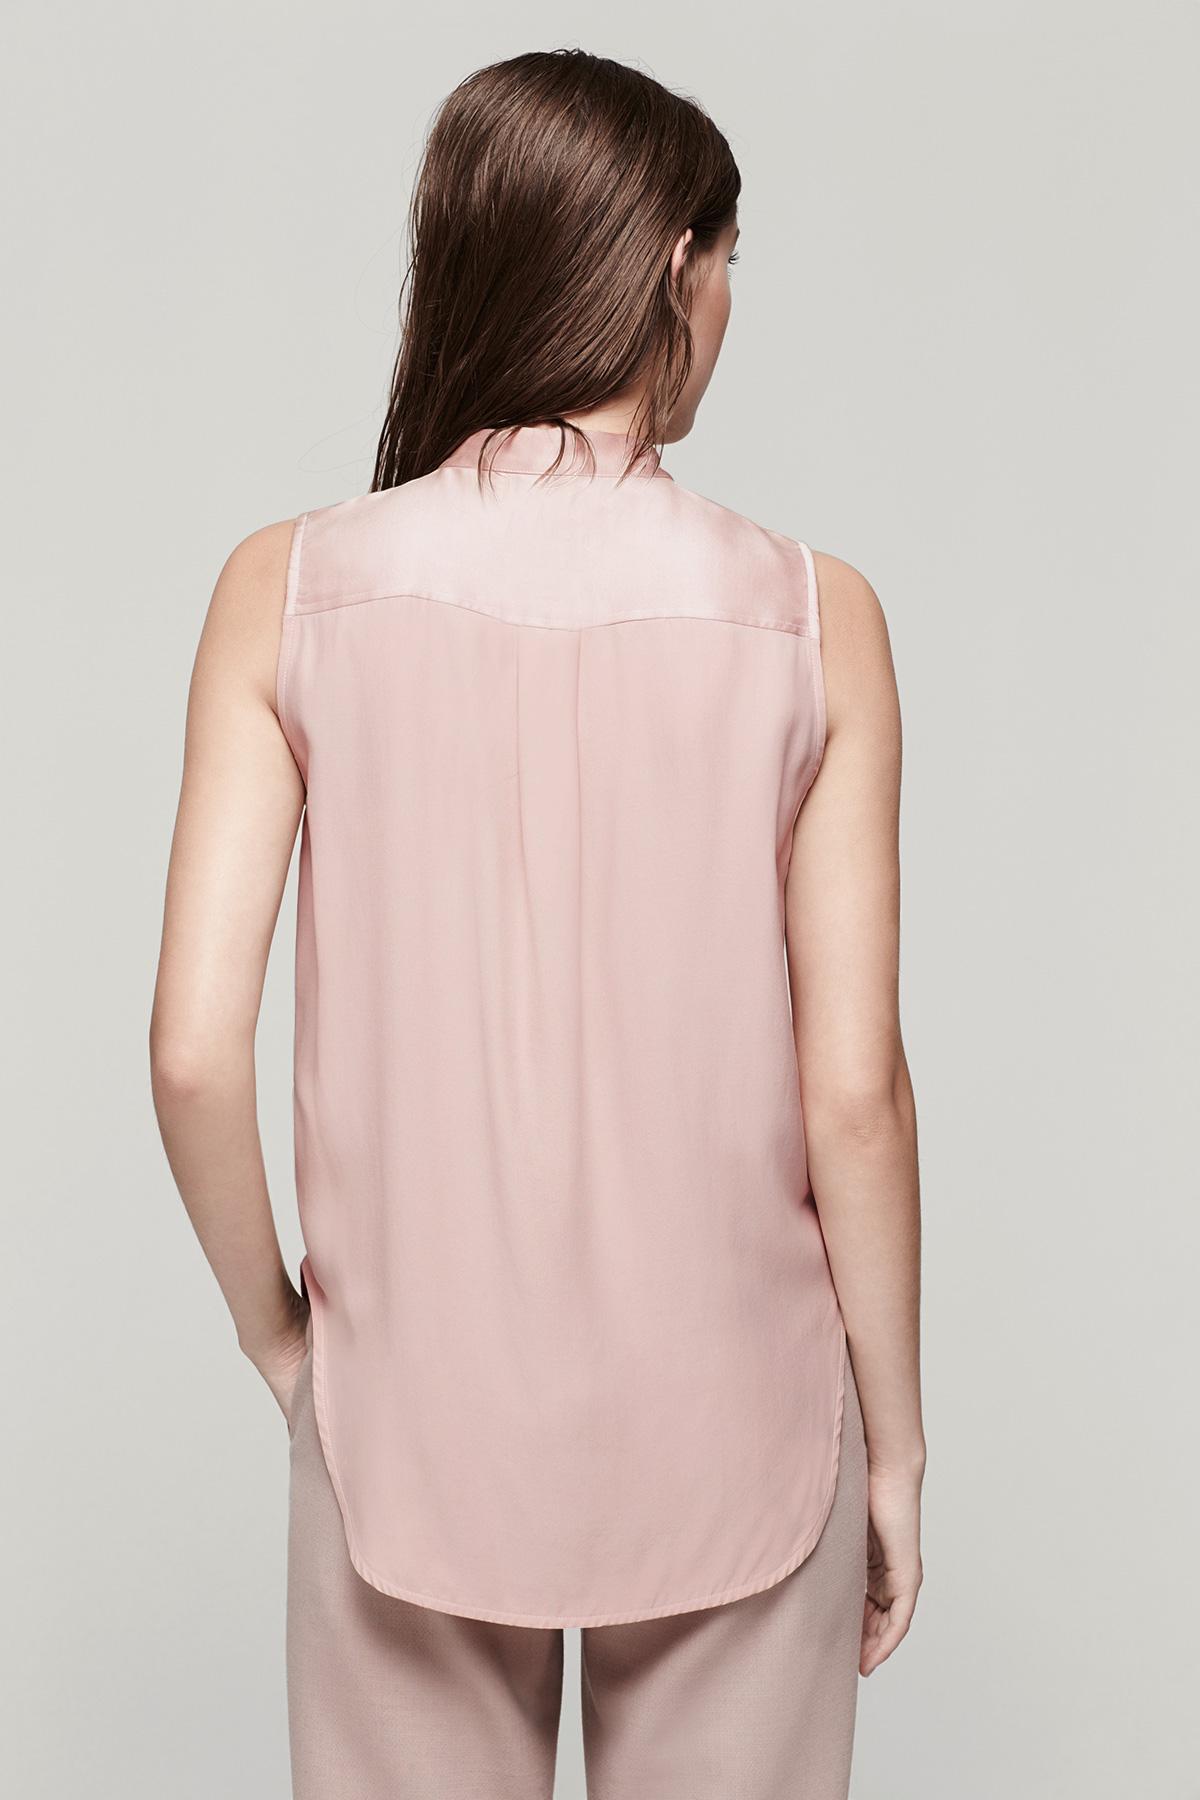 Rag bone kent shirt in pink lyst for Rag bone shirt